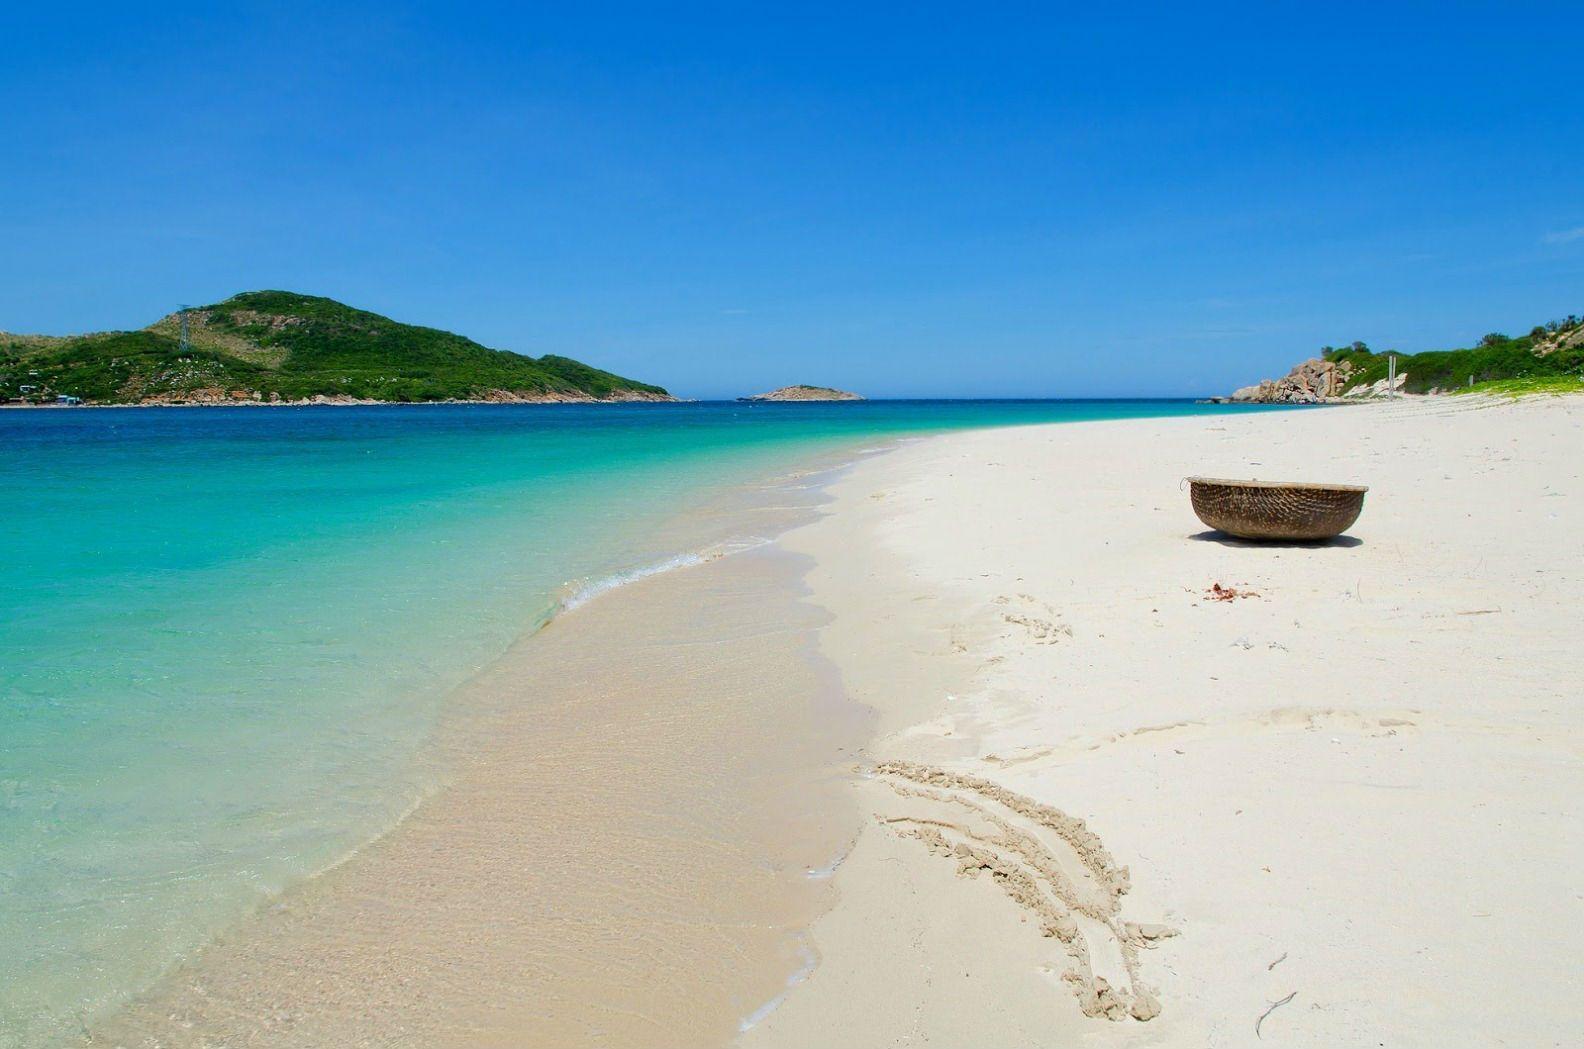 Biển Ninh Trữ